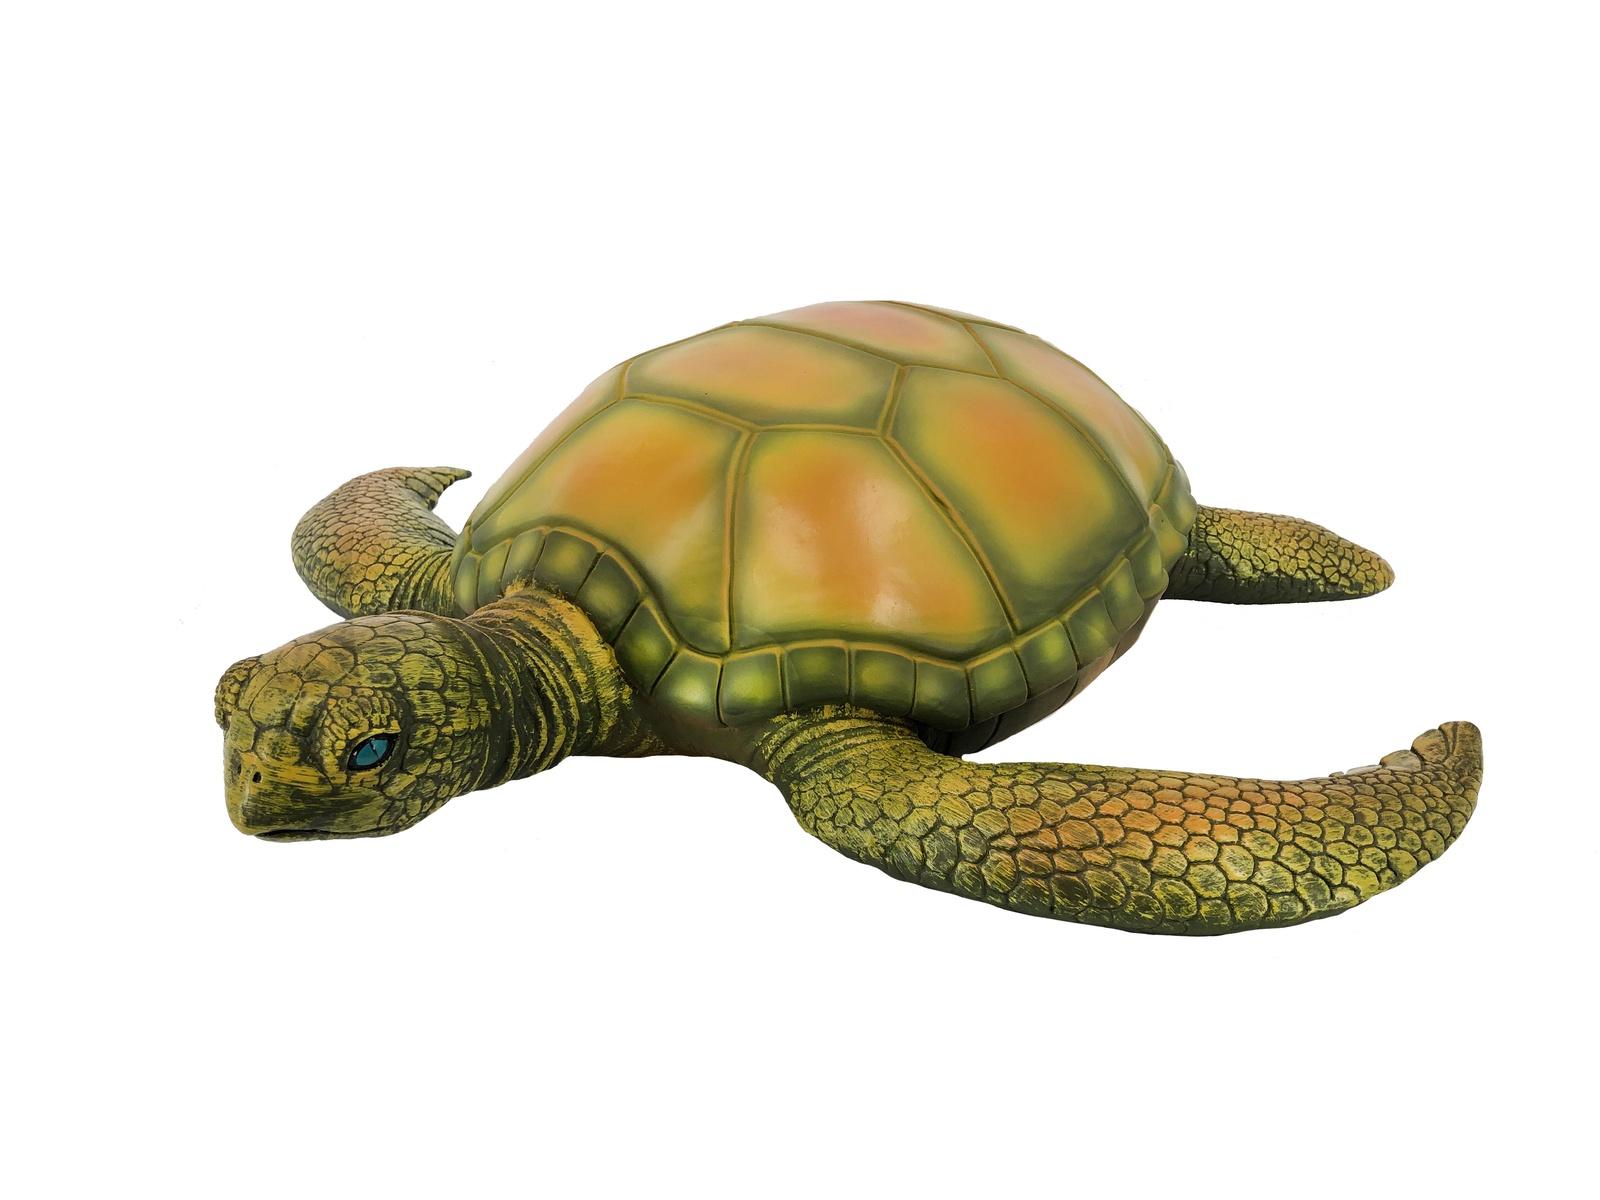 Фигурка АБВГДЕЙКА Черепаха 50 см, с мягкой набивкой